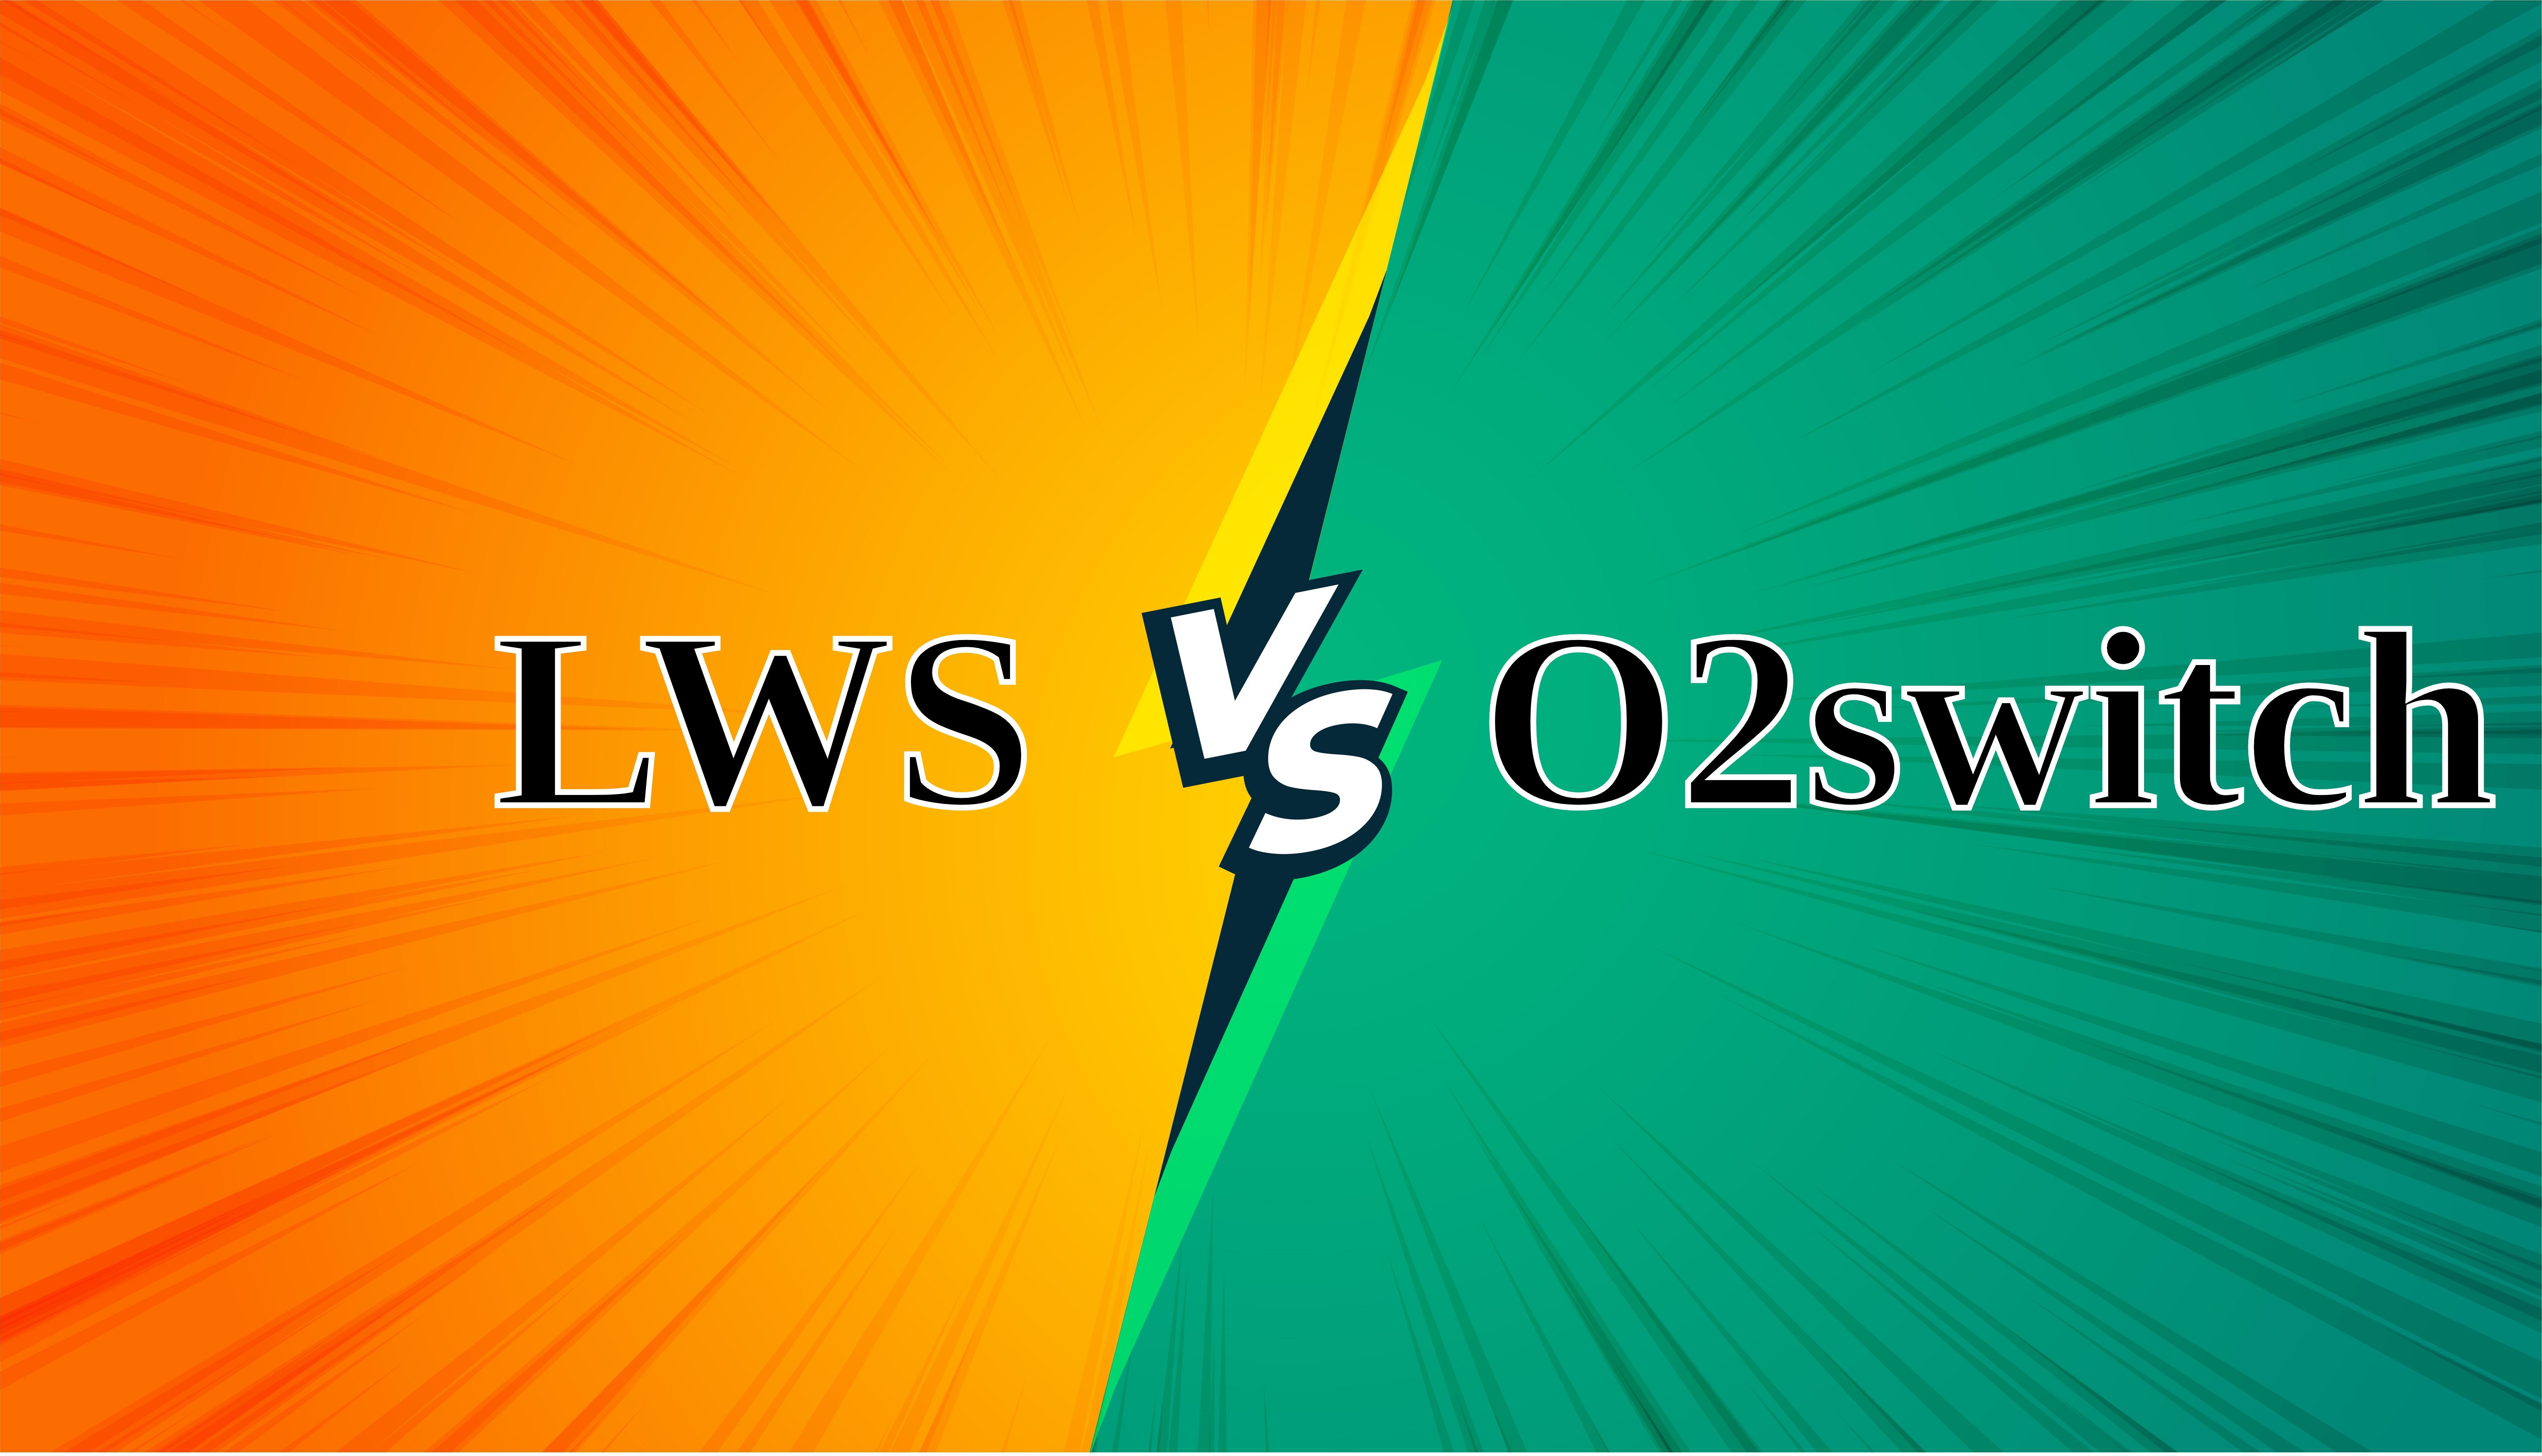 LWS vs O2switch